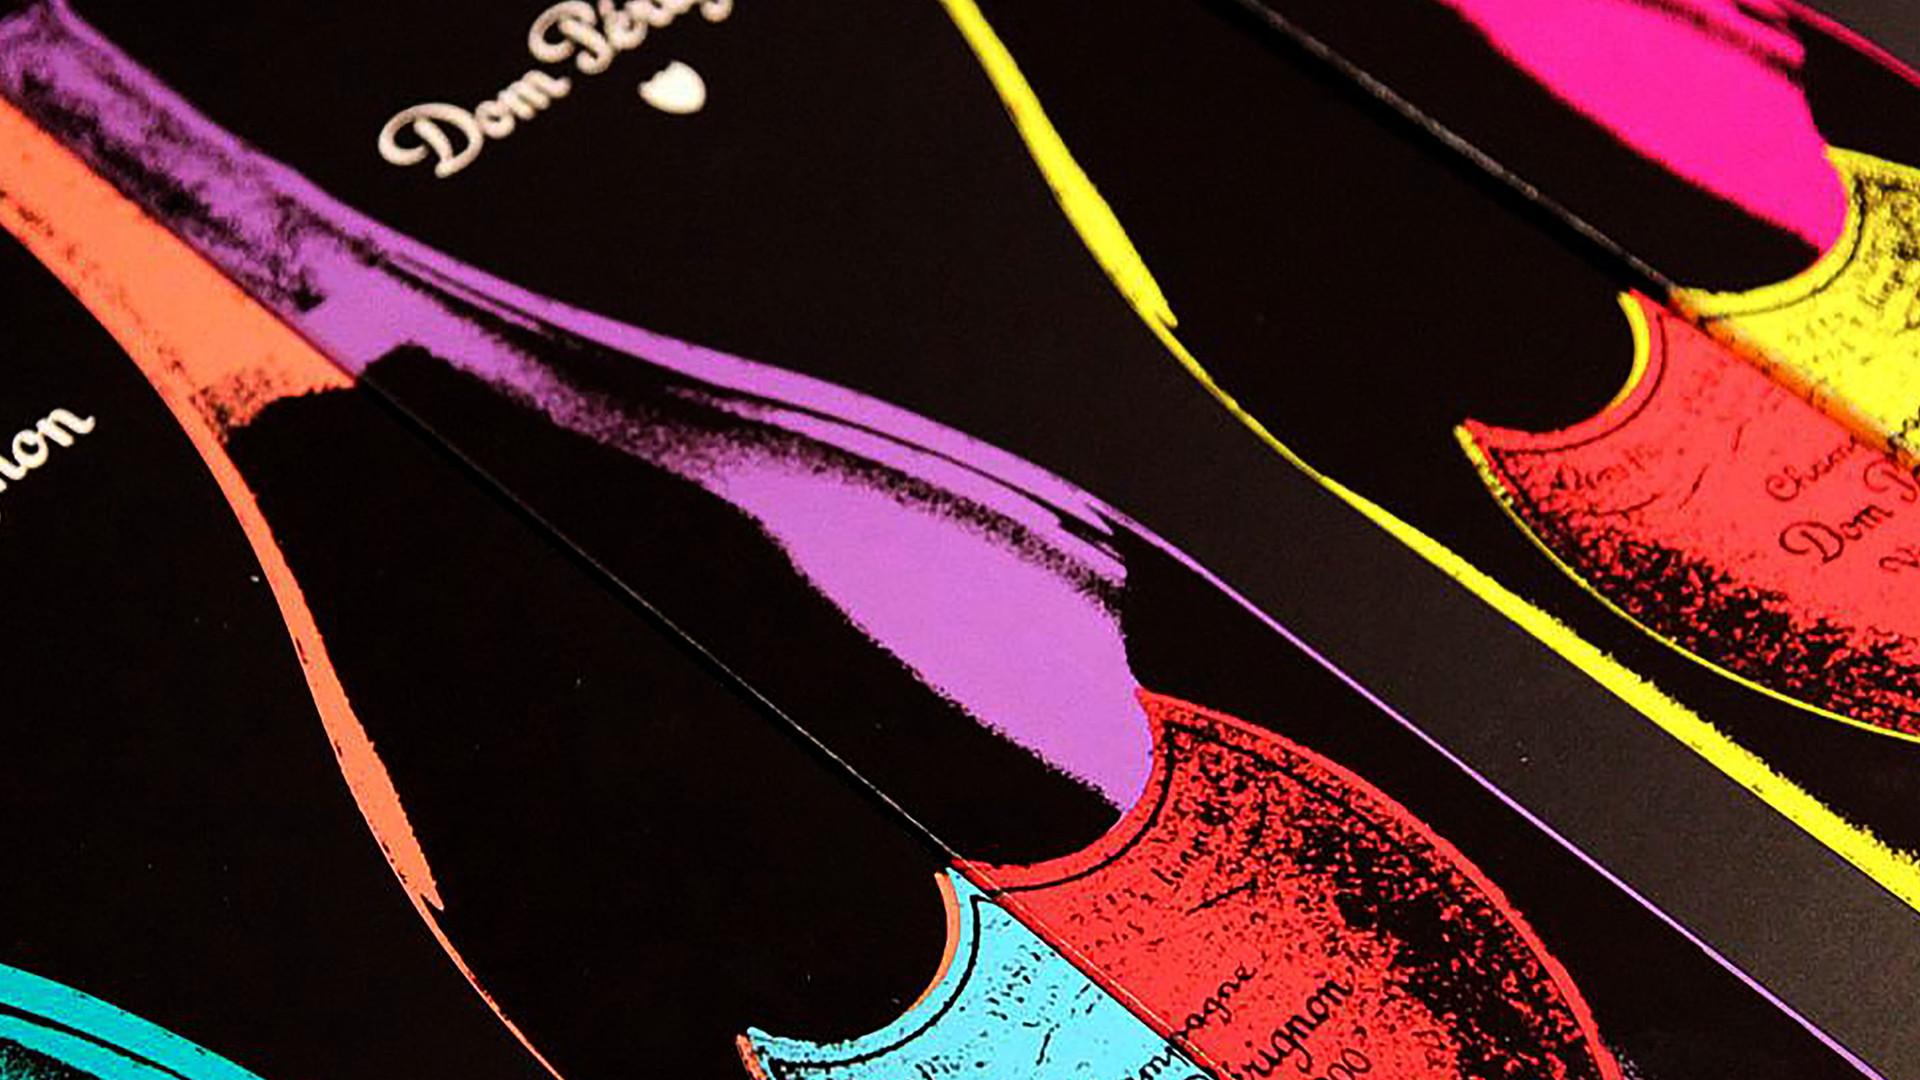 4K_Dom_Pérignon_0005_Details_1.jpg